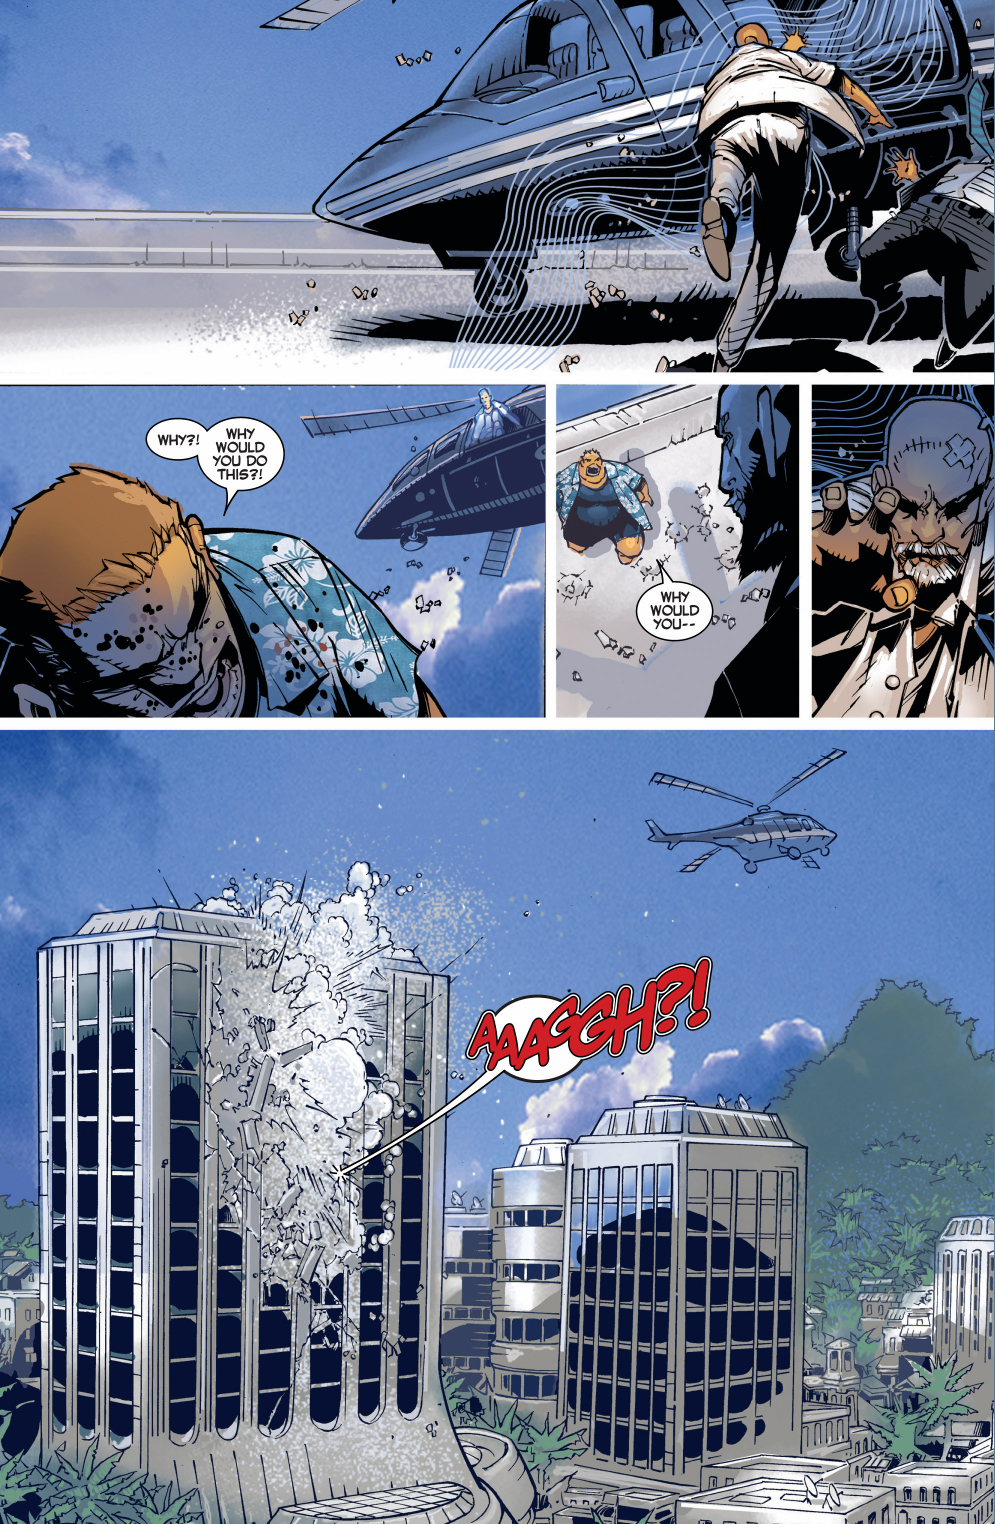 magneto takes down mystique, blob, sabretooth and silver samurai